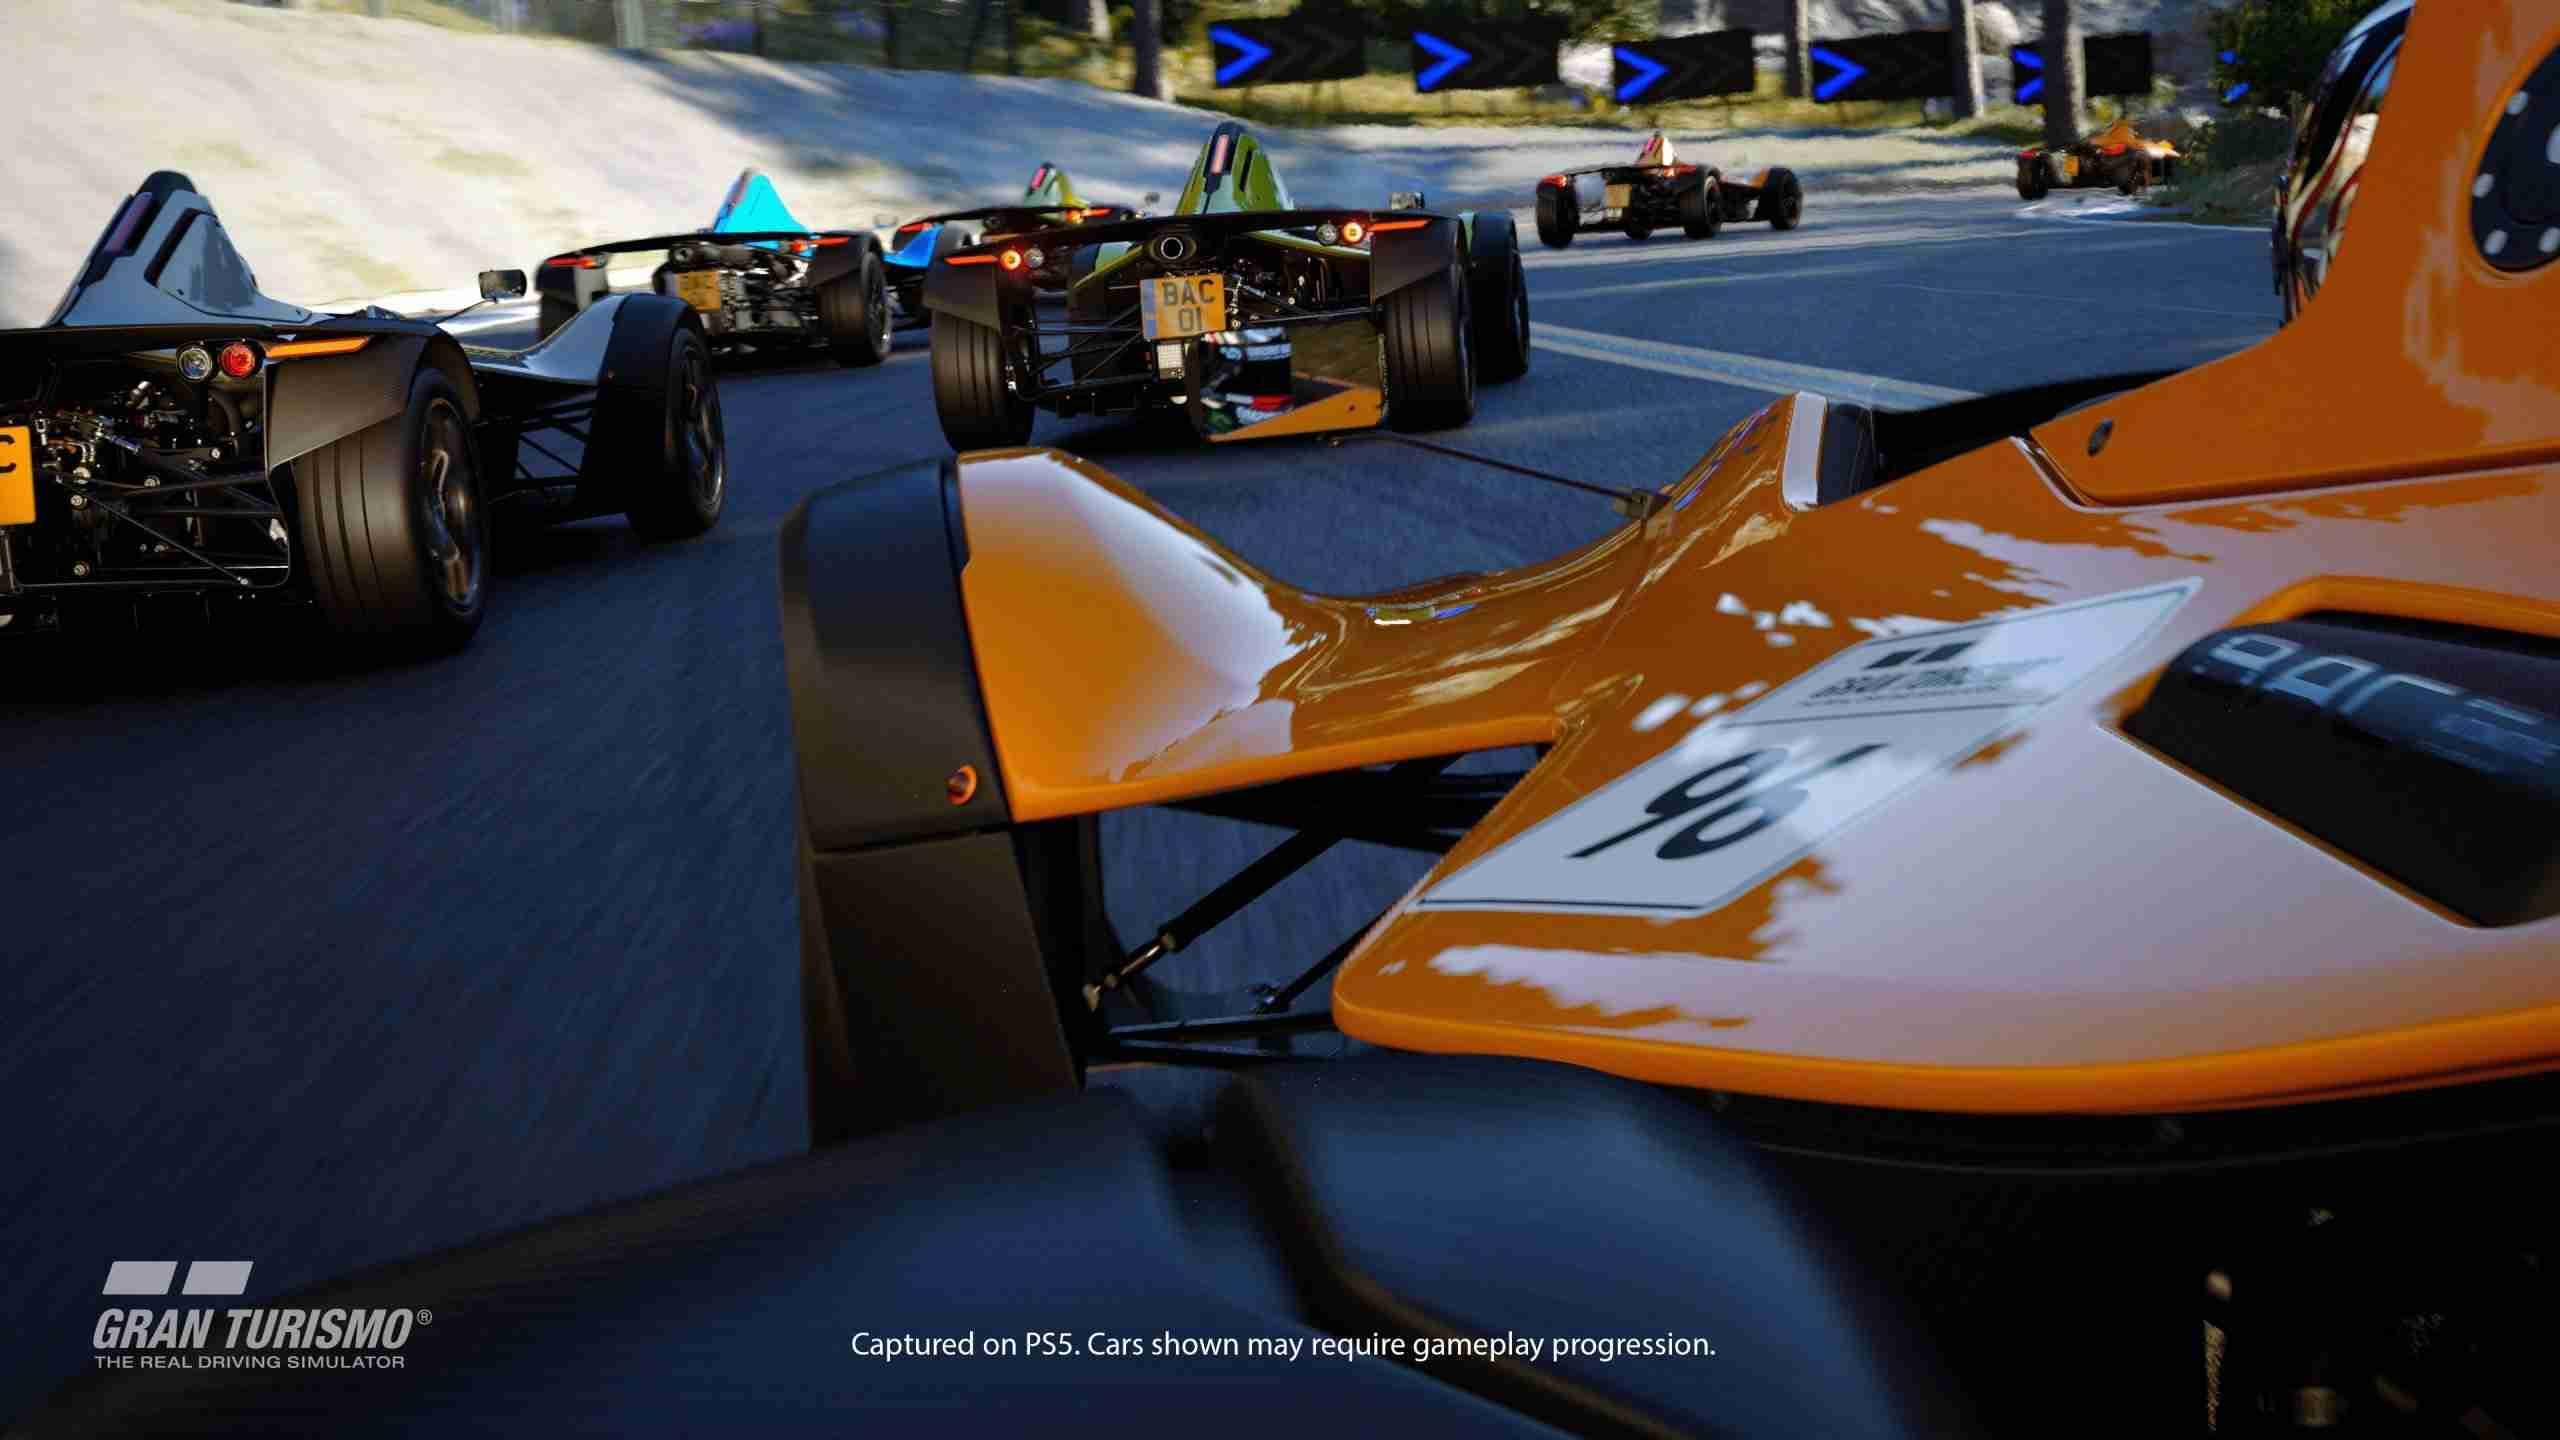 Gran Turismo 7 delayed